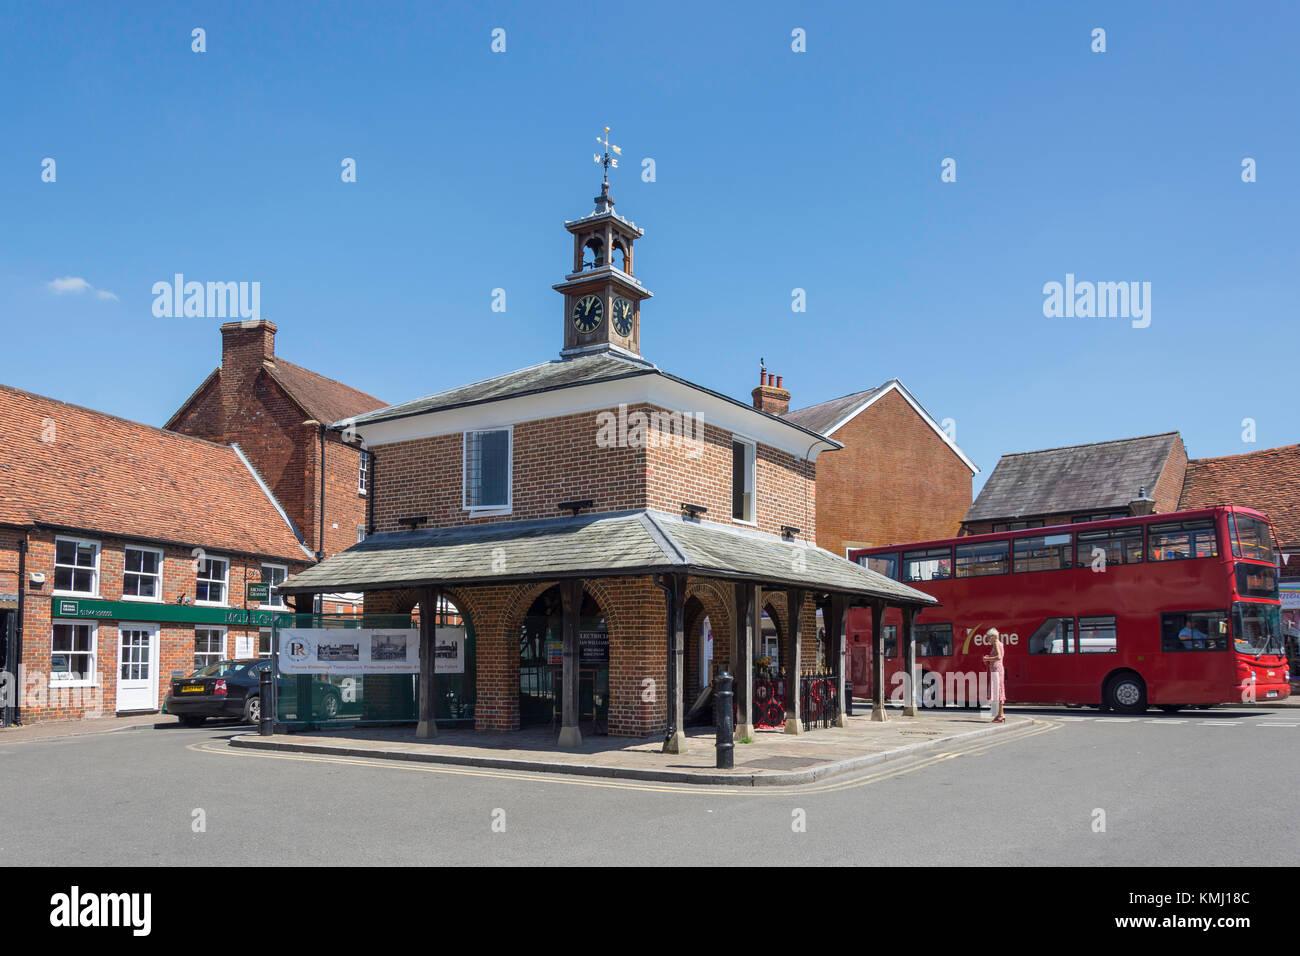 17th century Market House, Market Square, Princes Risborough,  Buckinghamshire, England, United